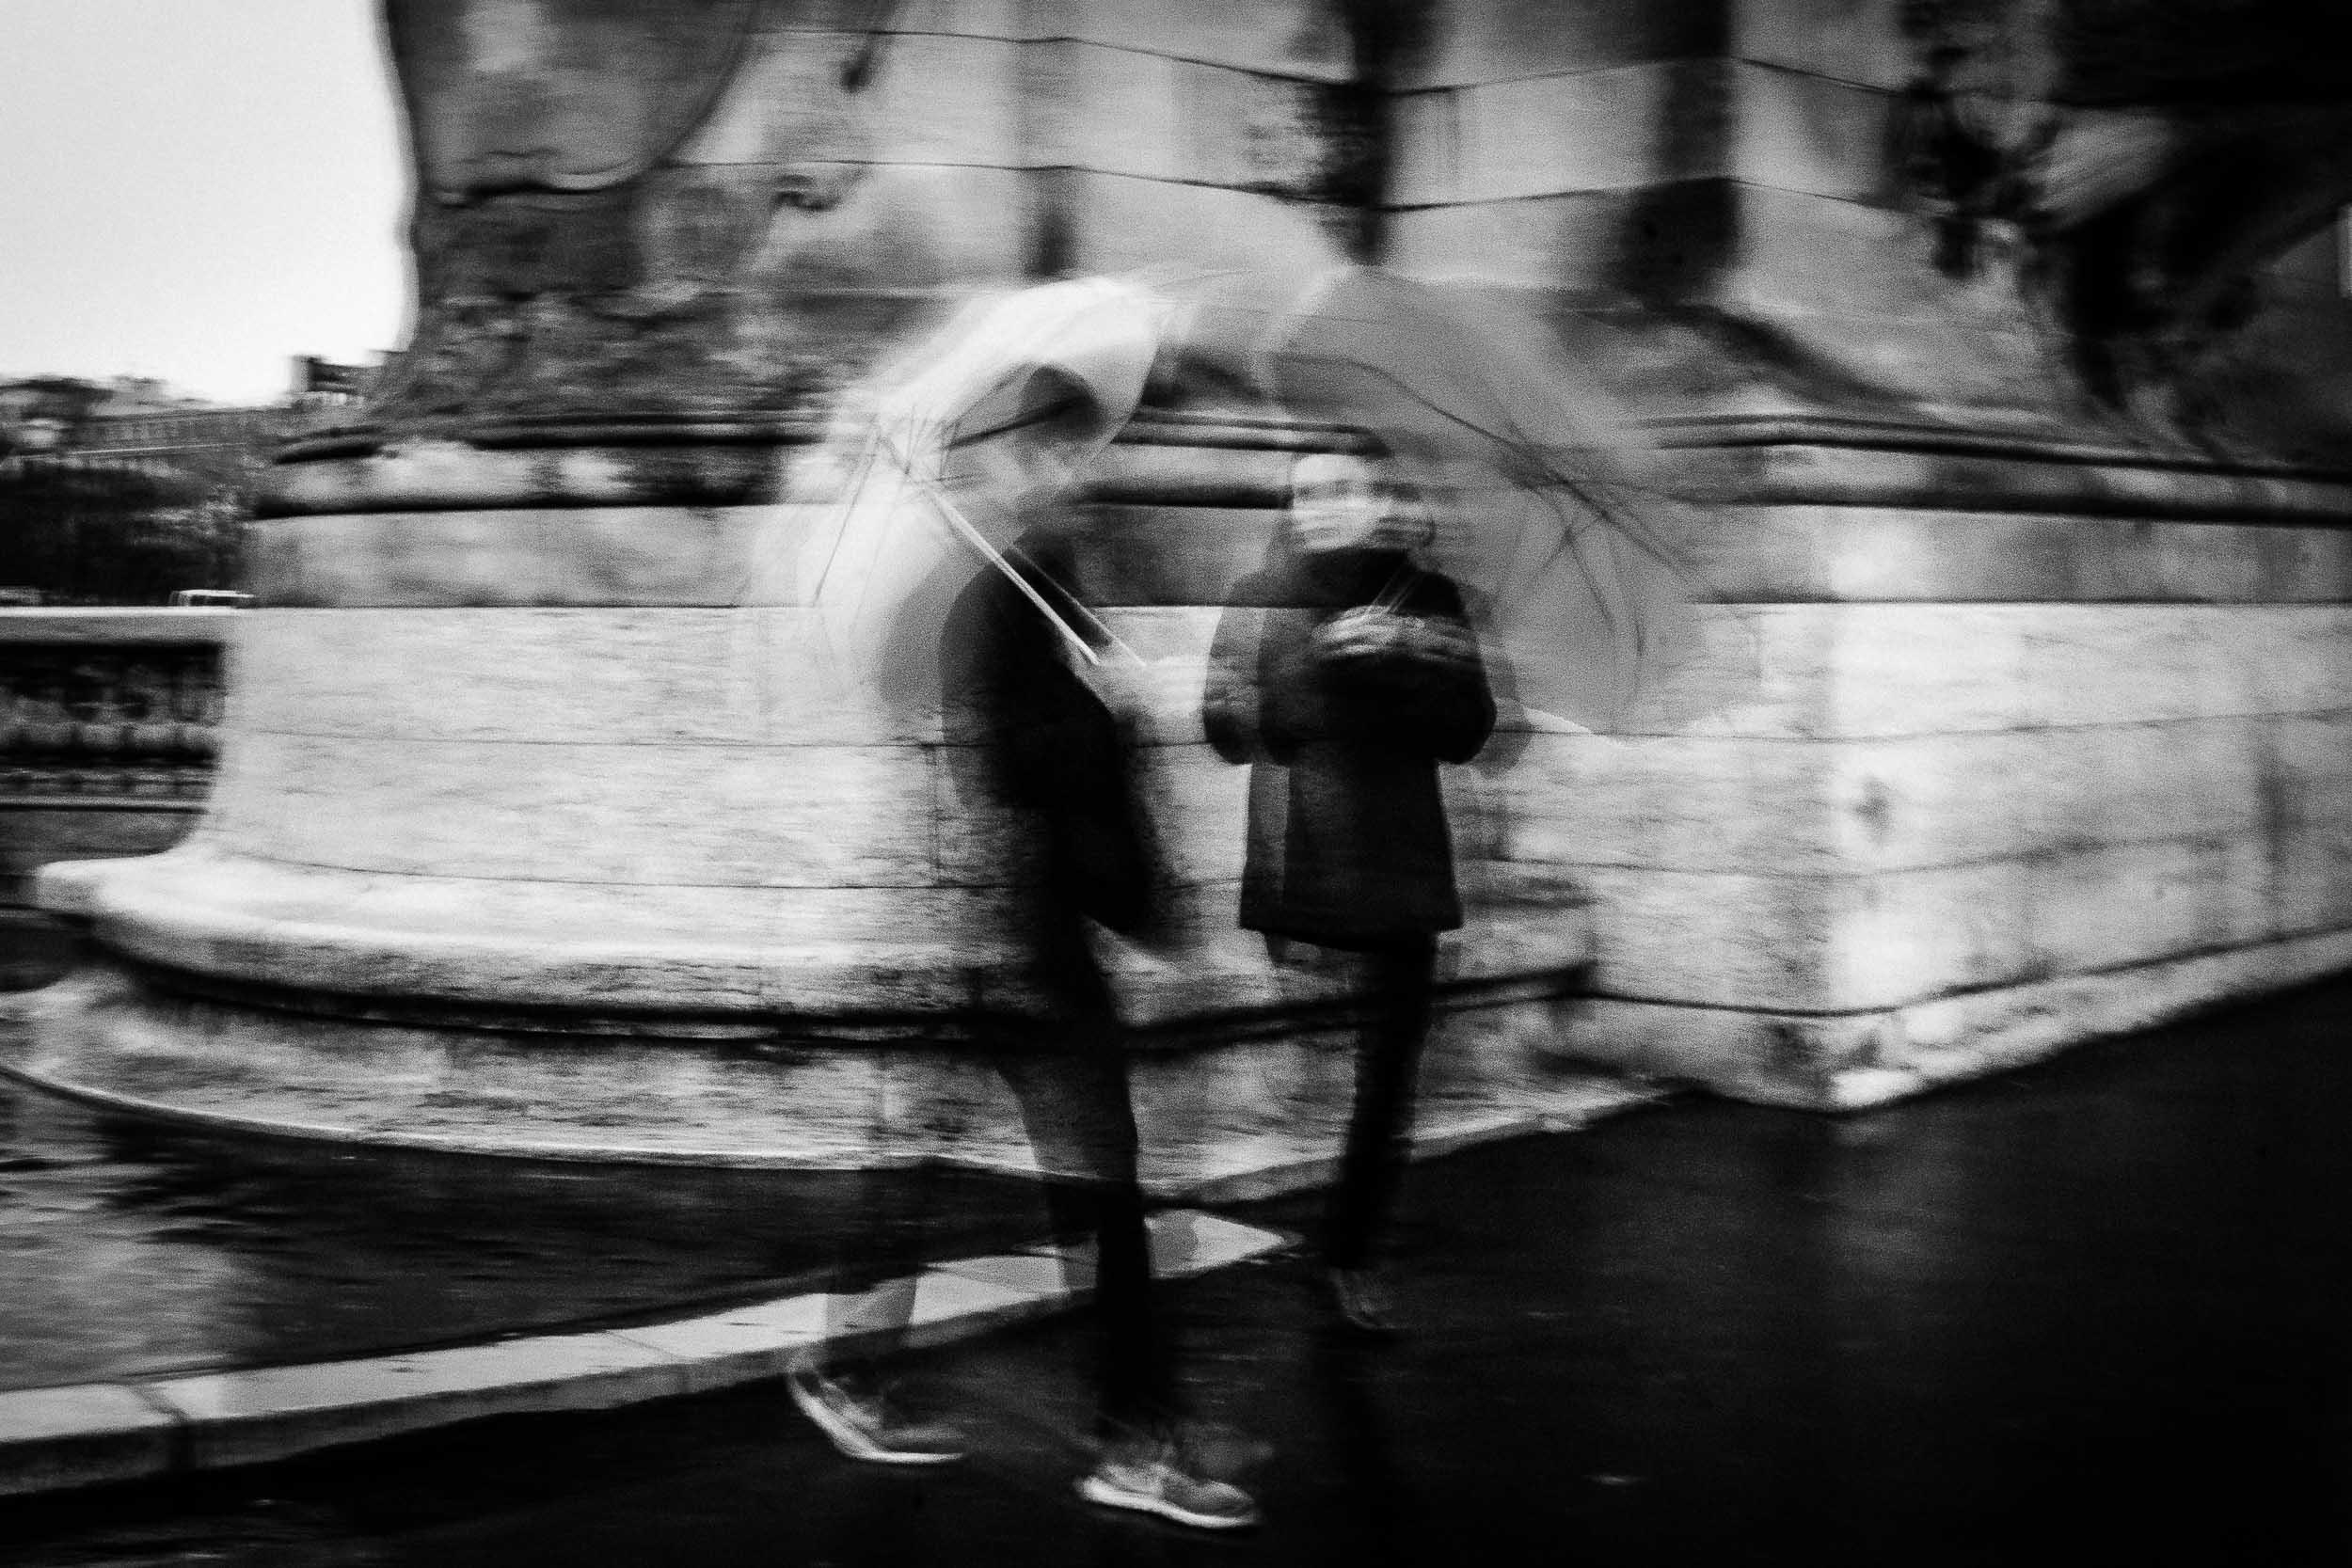 Paris-couple-walking-with-umbrellas.jpg